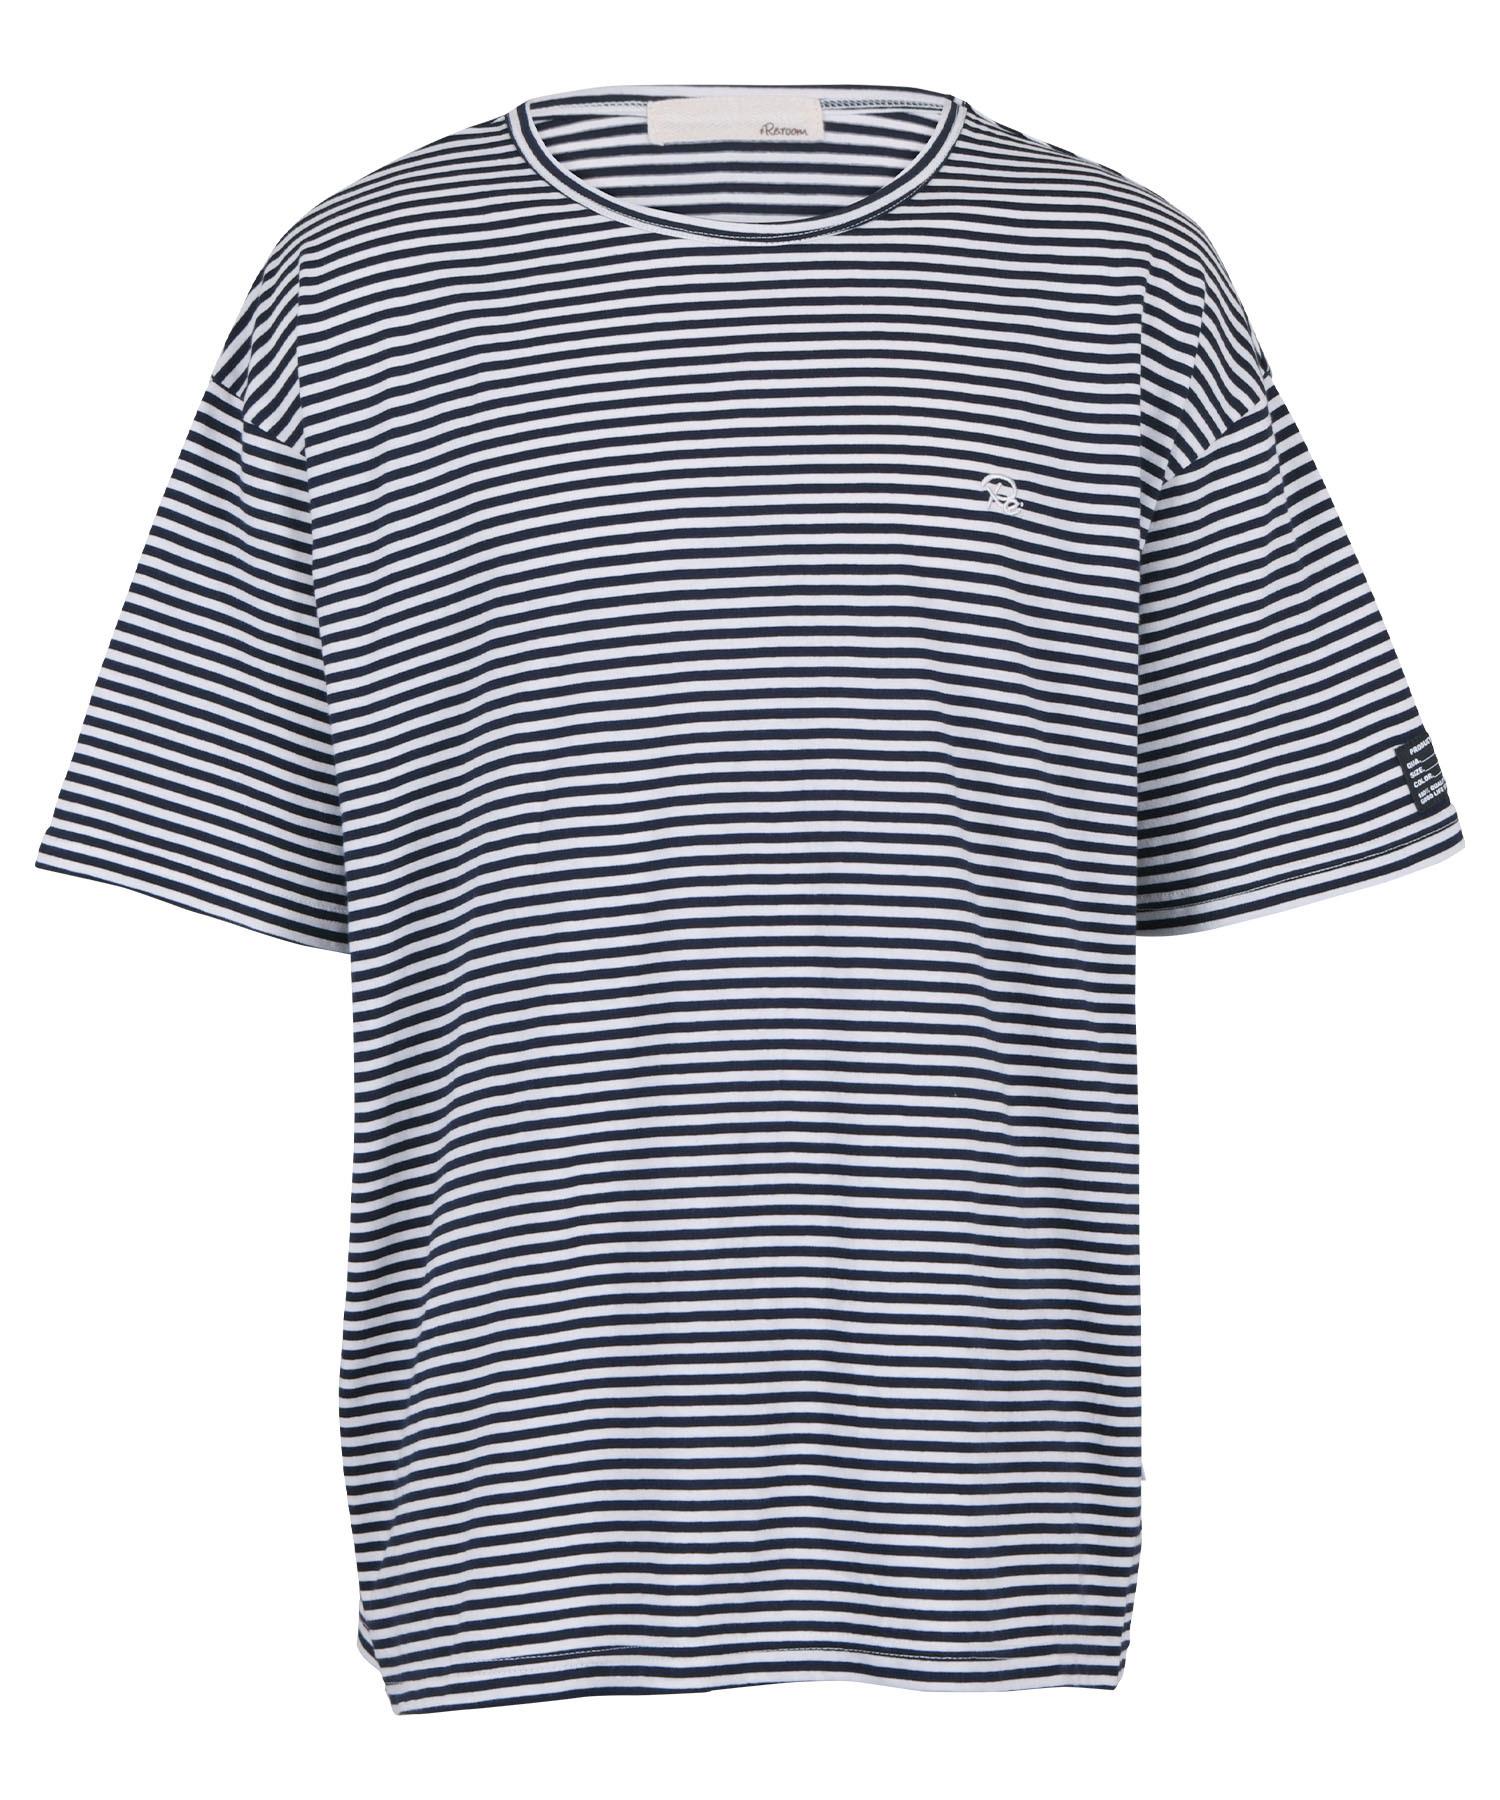 ONE POINT BORDER BIG T-shirt[REC503]